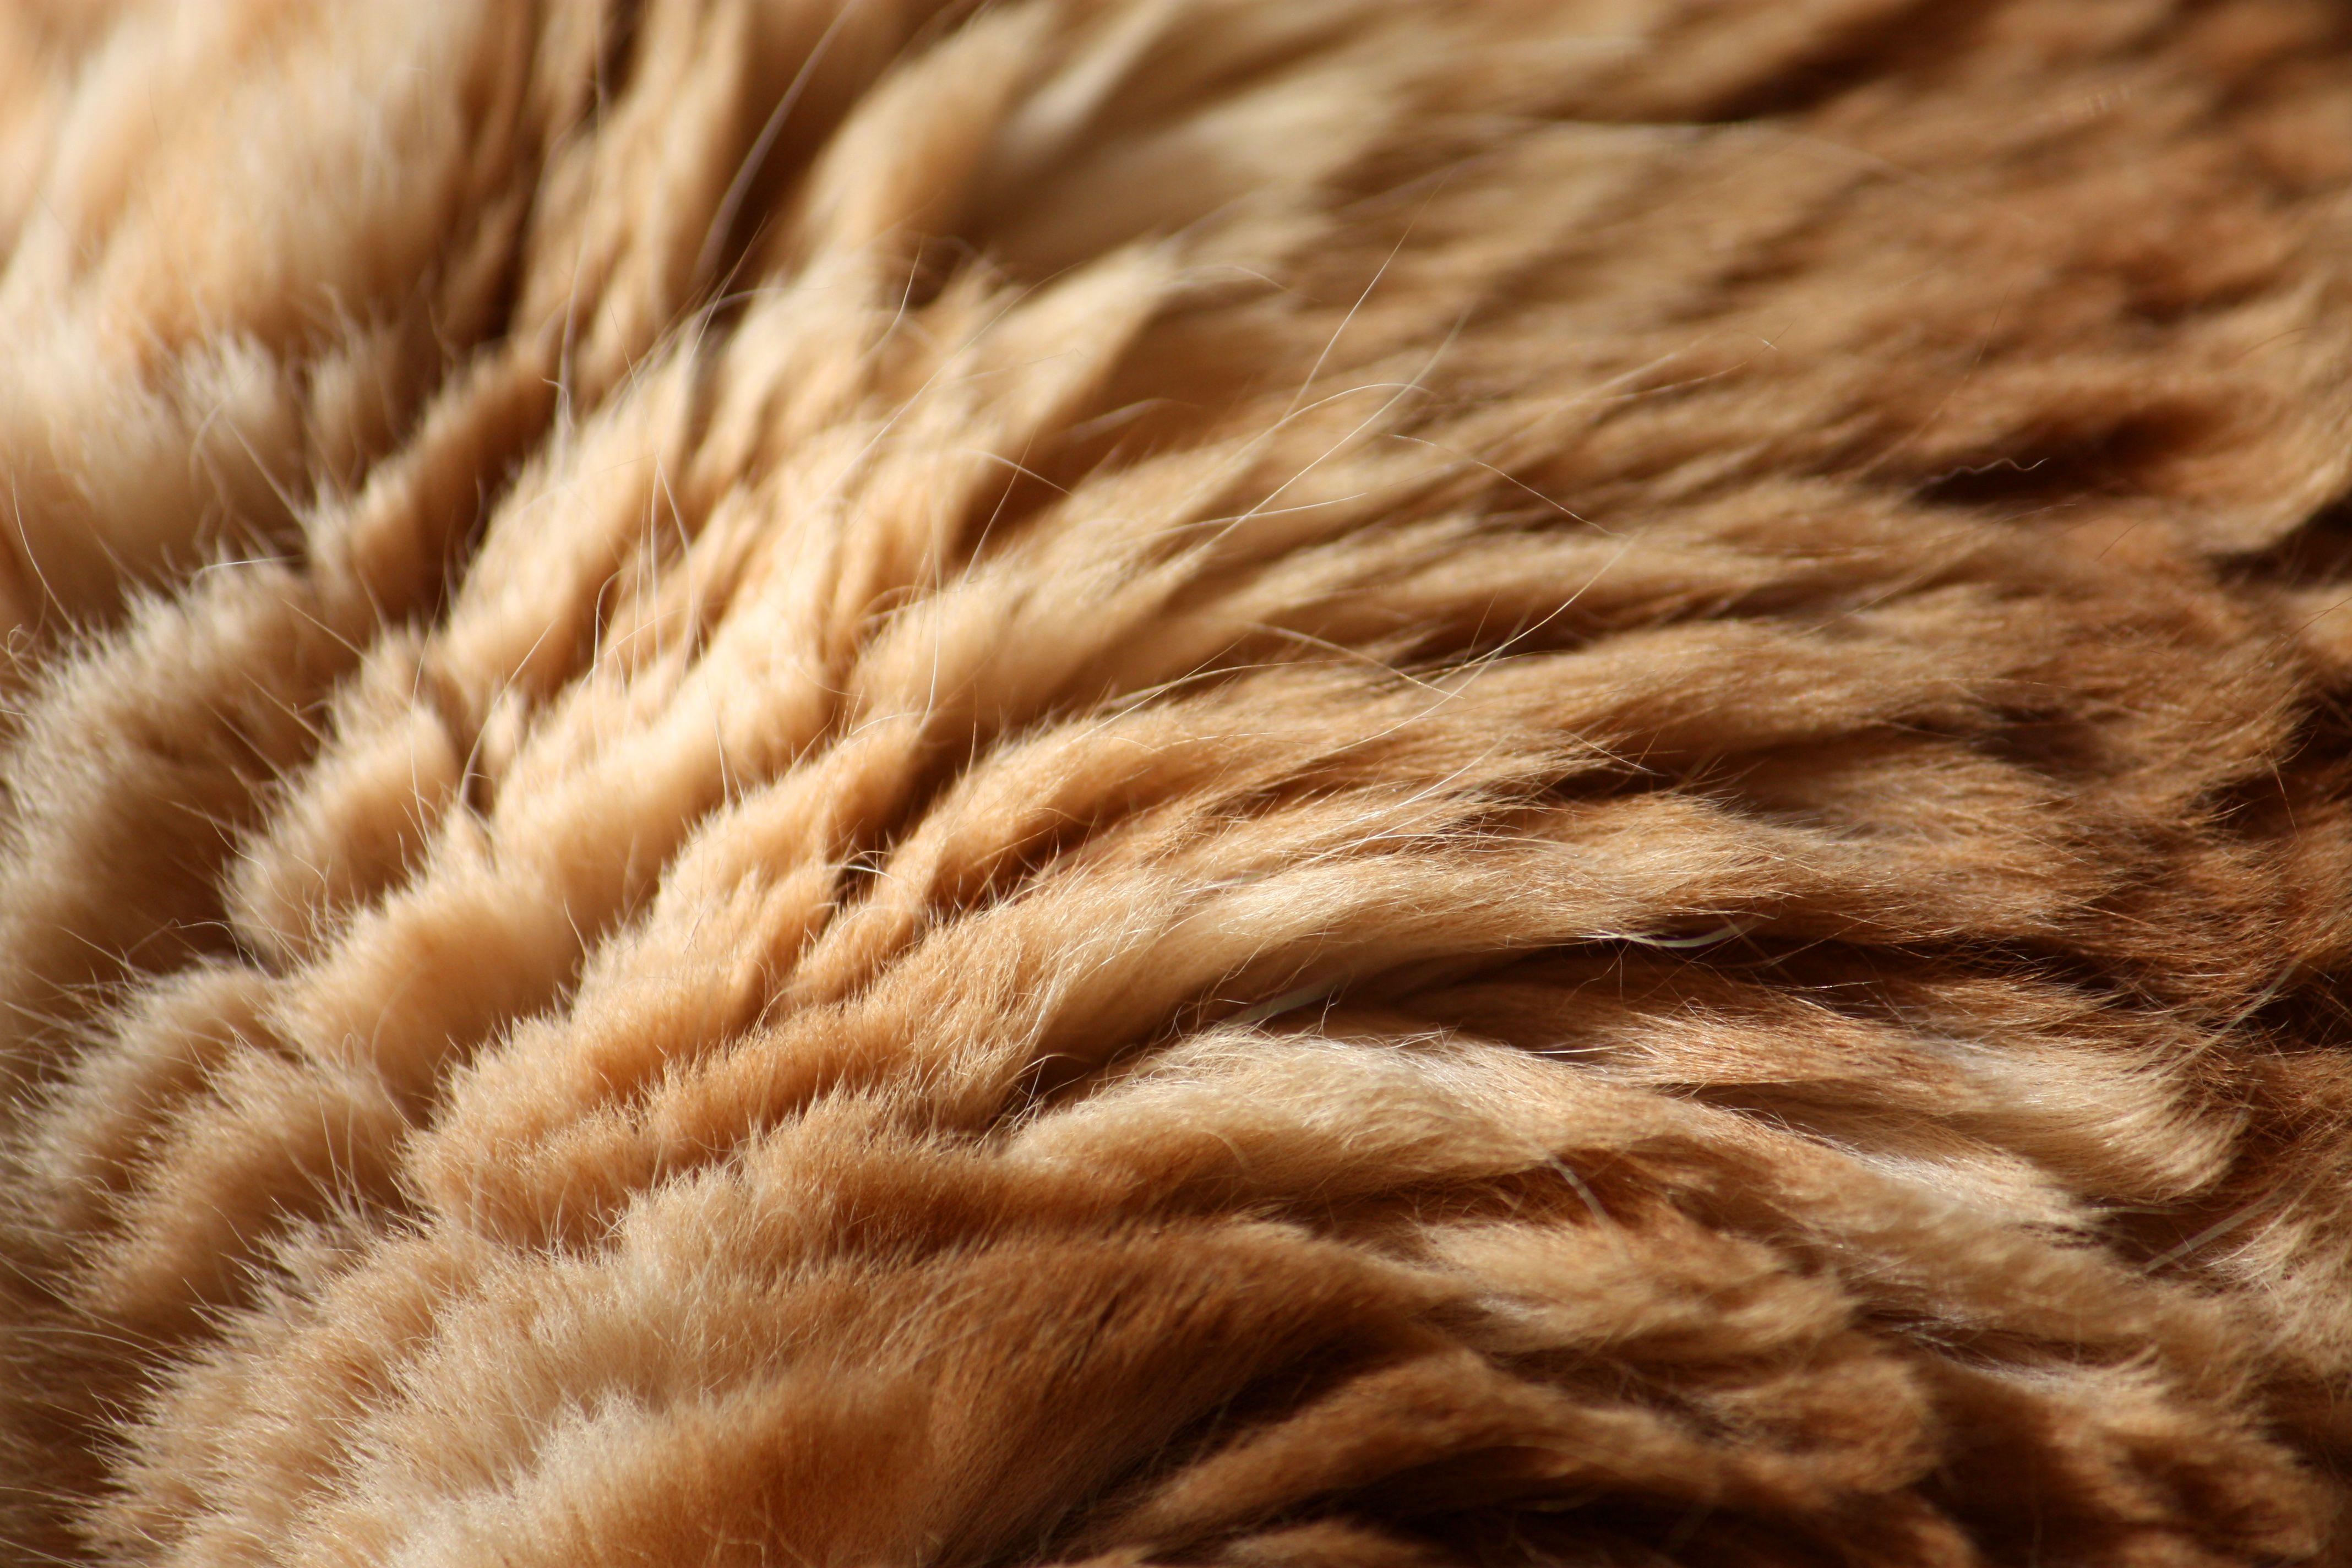 texture fur animal background - photo #8